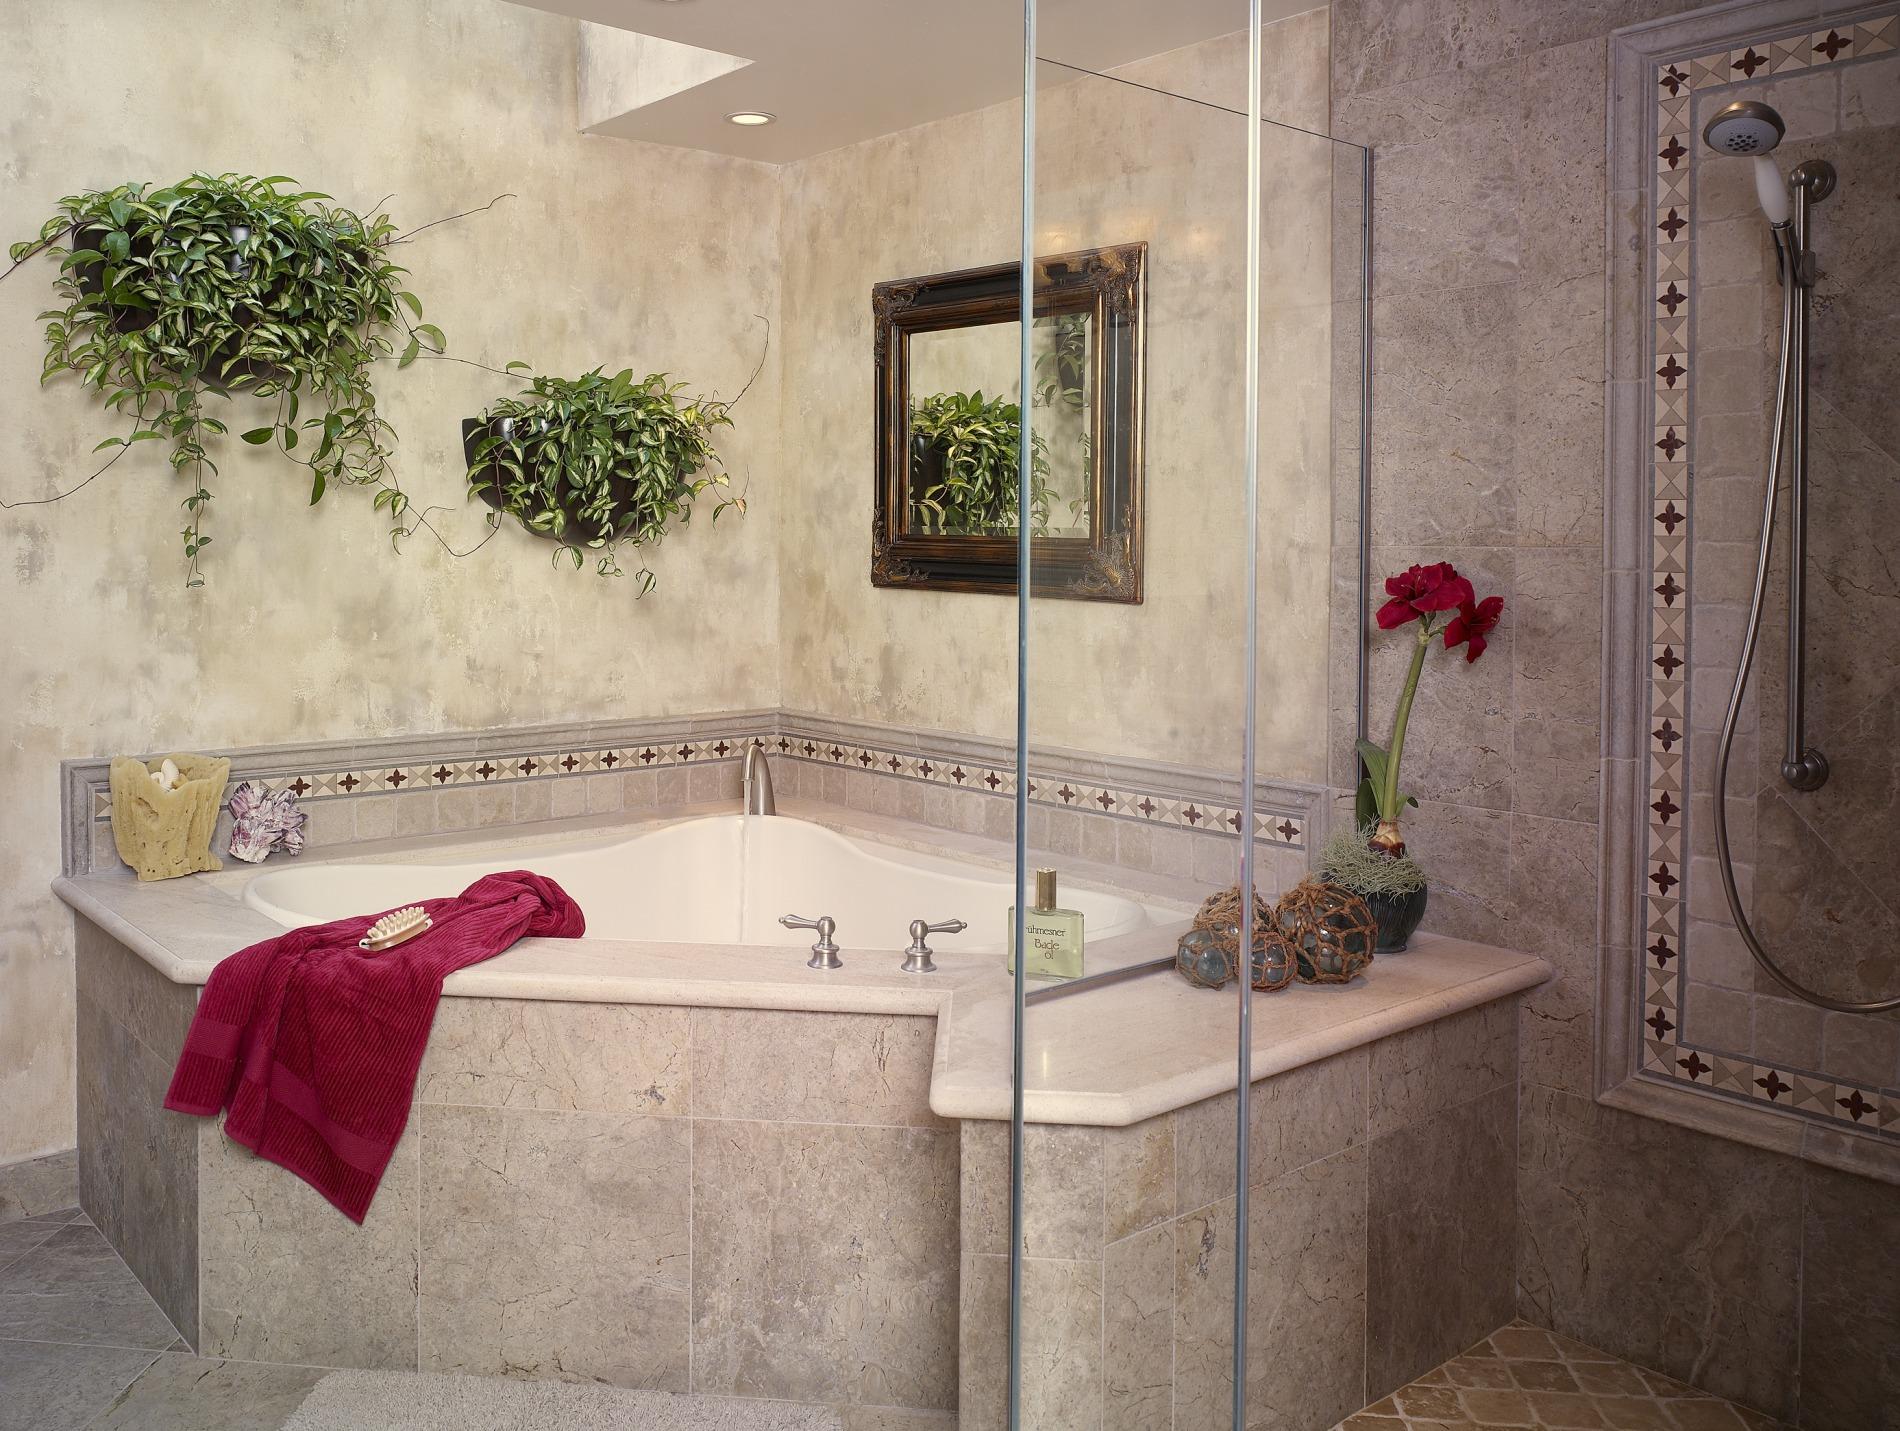 Corner Tub And Shower Pool Design Ideas